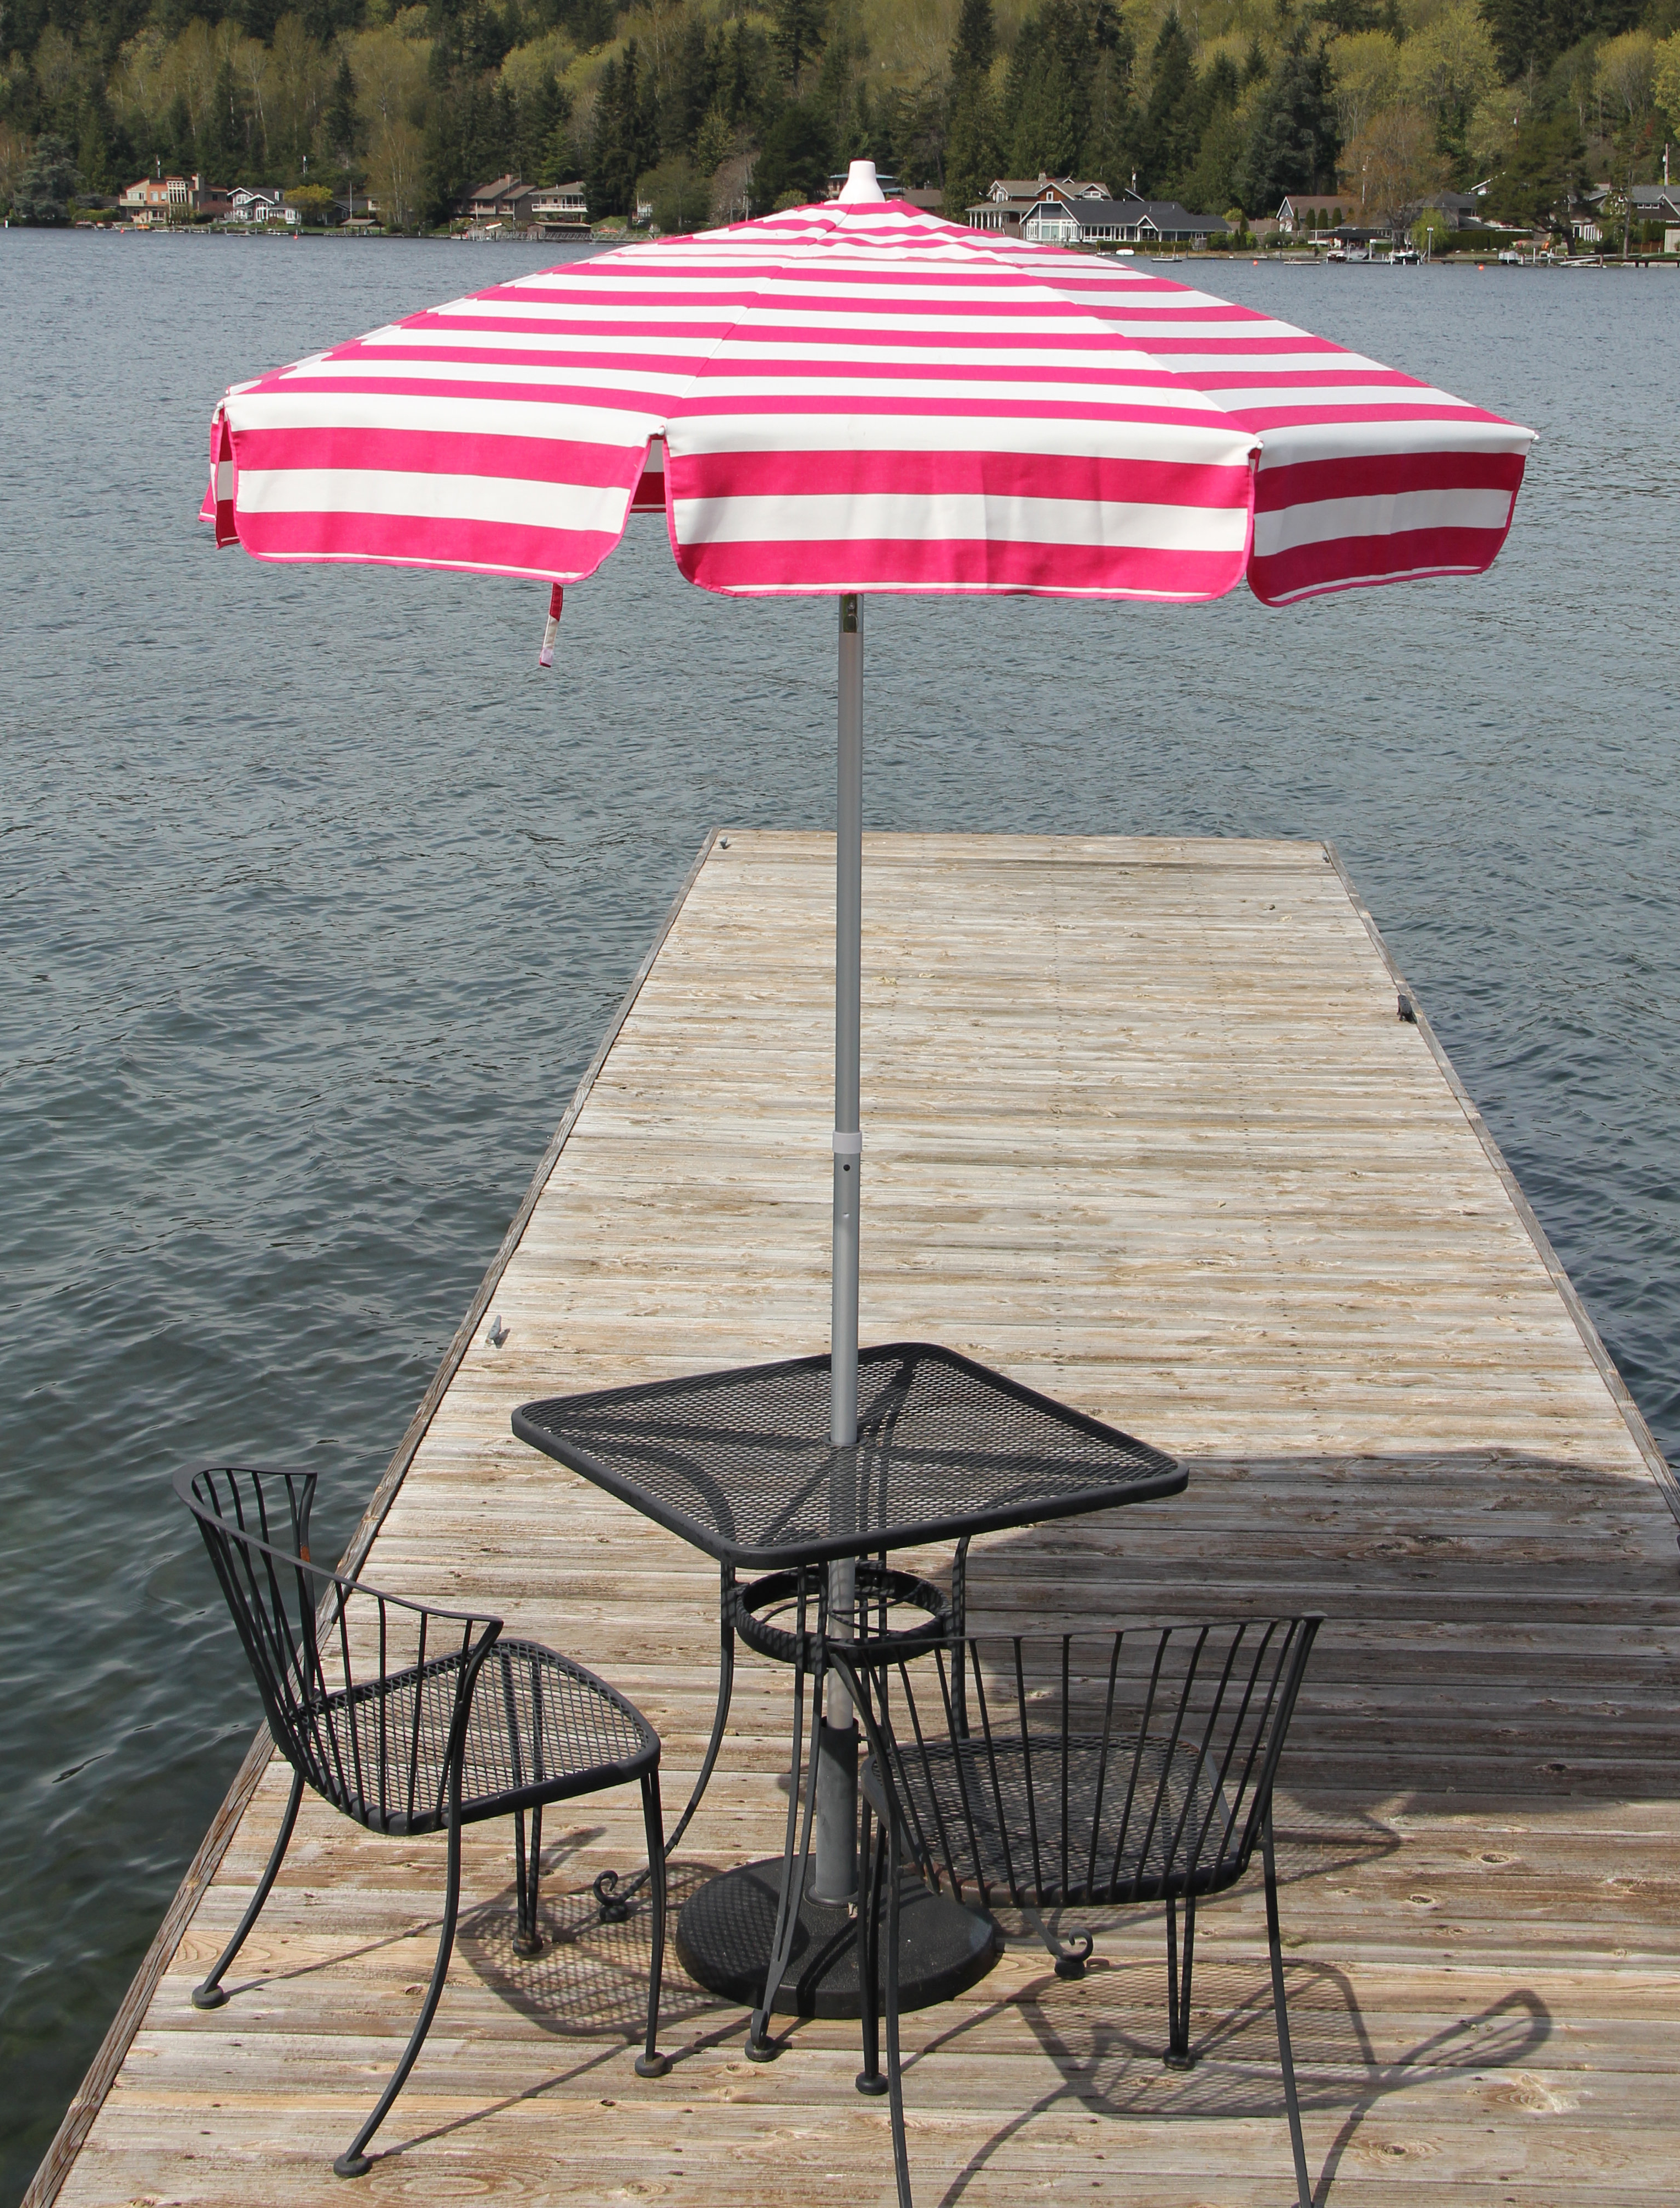 Italian Market Umbrellas With Regard To Recent Italian 6' Market Umbrella (View 11 of 20)